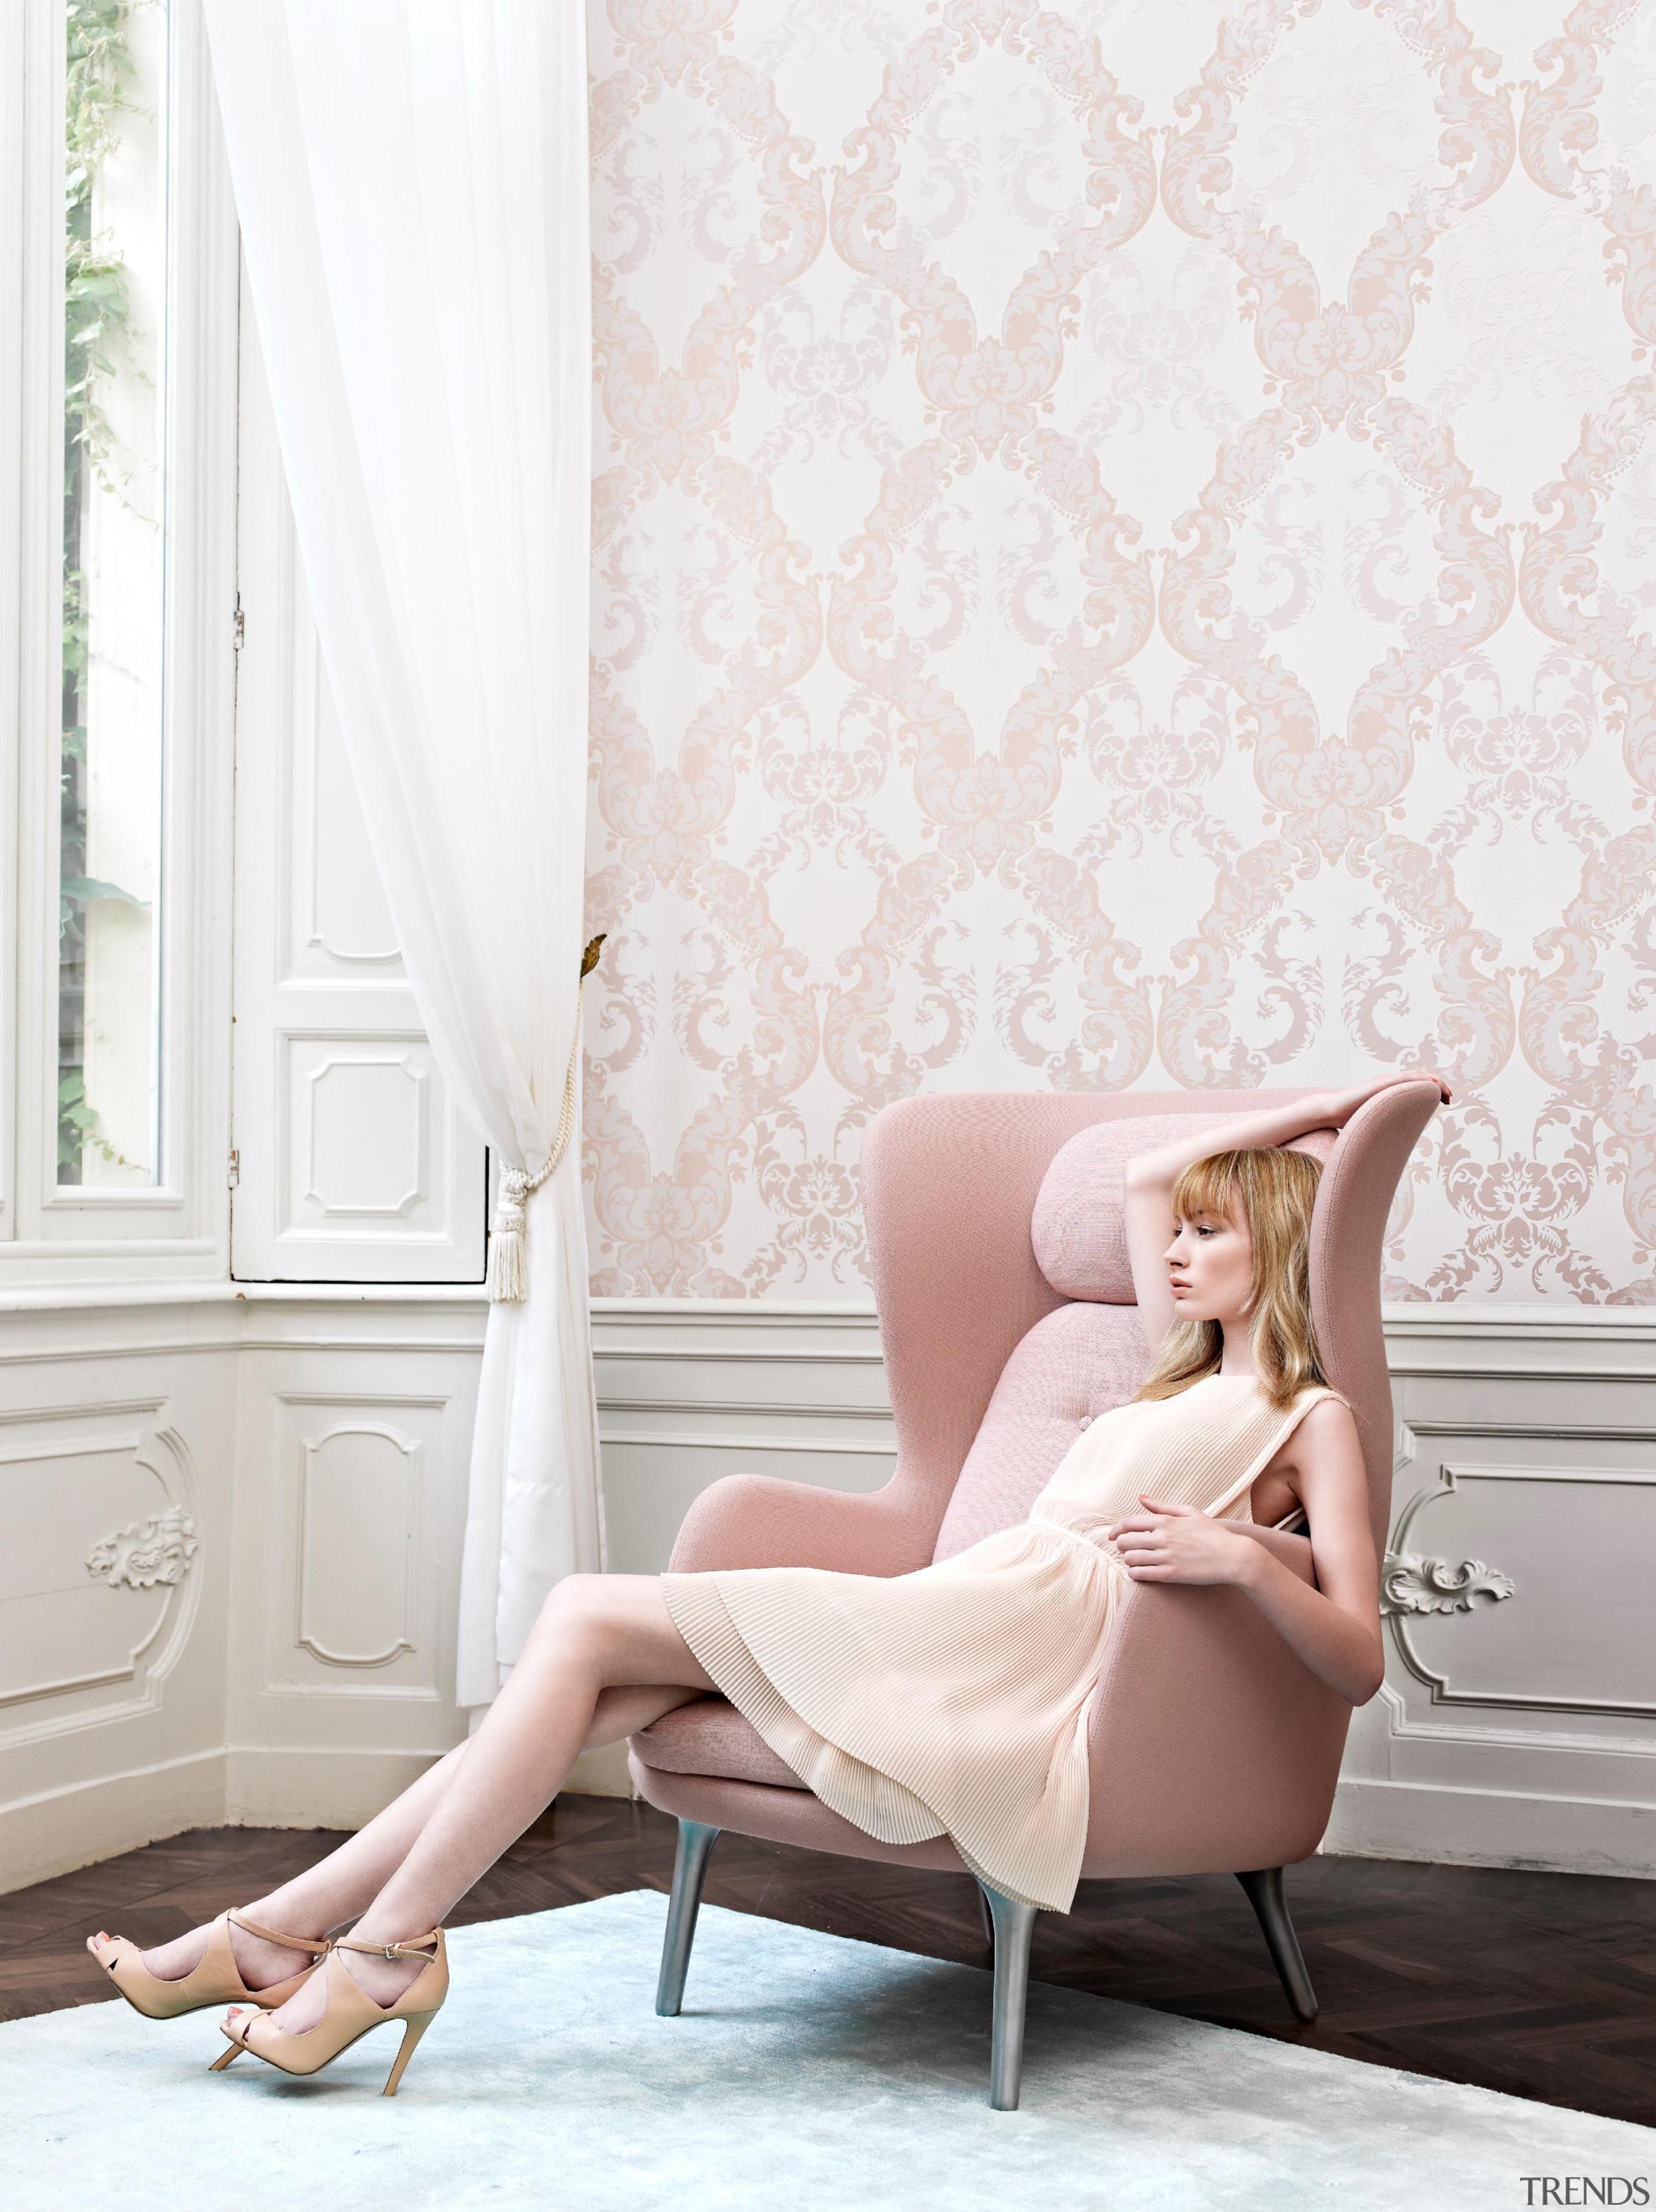 Camarque Range - Camarque Range - beauty   beauty, blond, chair, couch, floor, flooring, furniture, girl, human hair color, interior design, leg, long hair, photo shoot, pink, shoulder, sitting, wallpaper, white